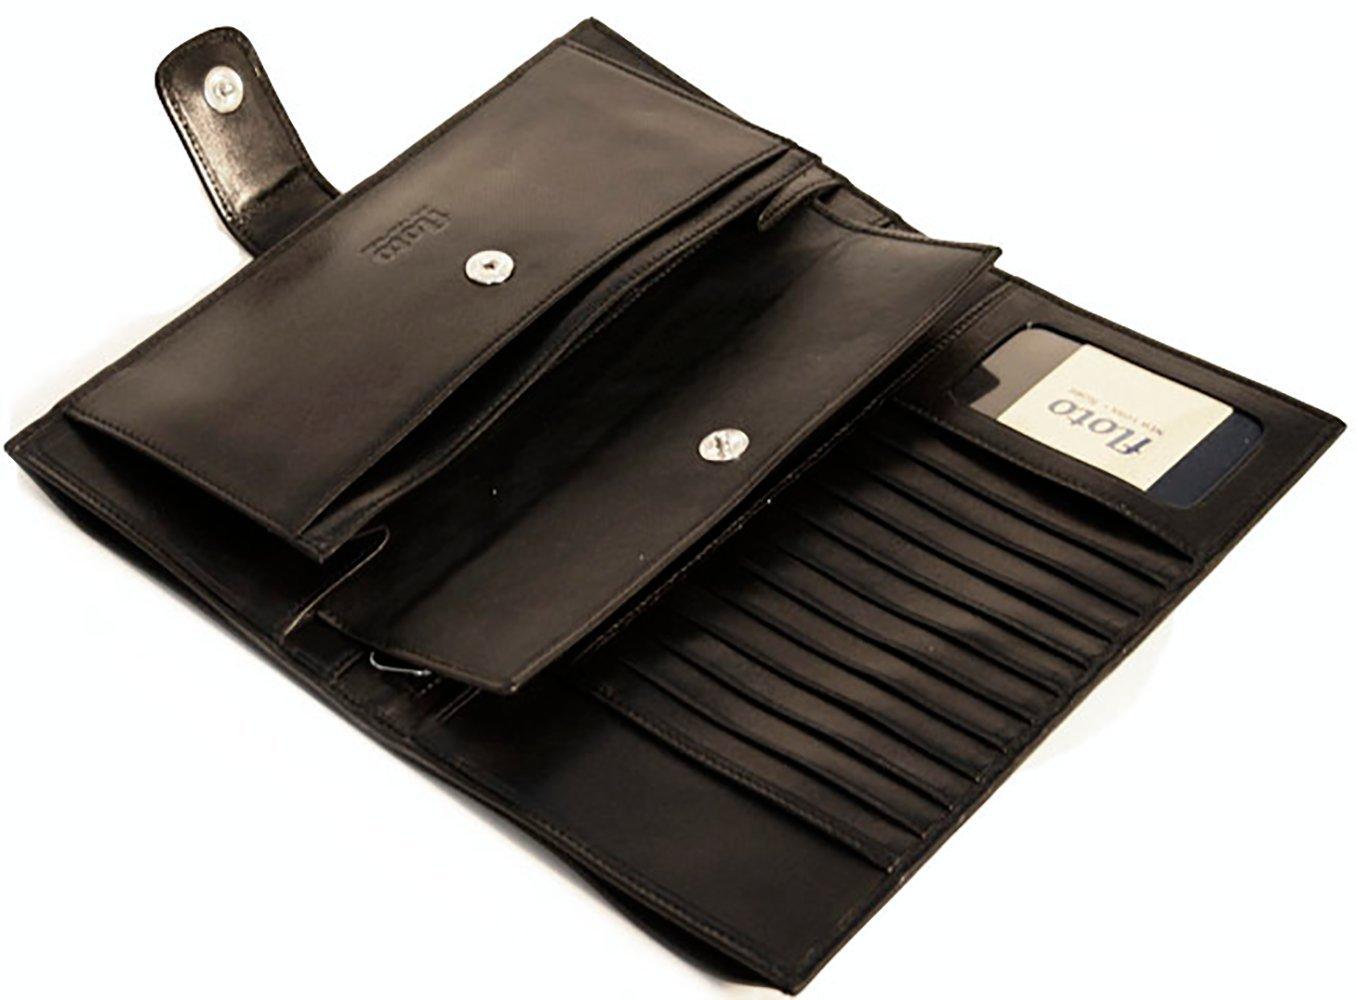 Firenze Leather Document Folder Color: Black by Floto Imports (Image #1)